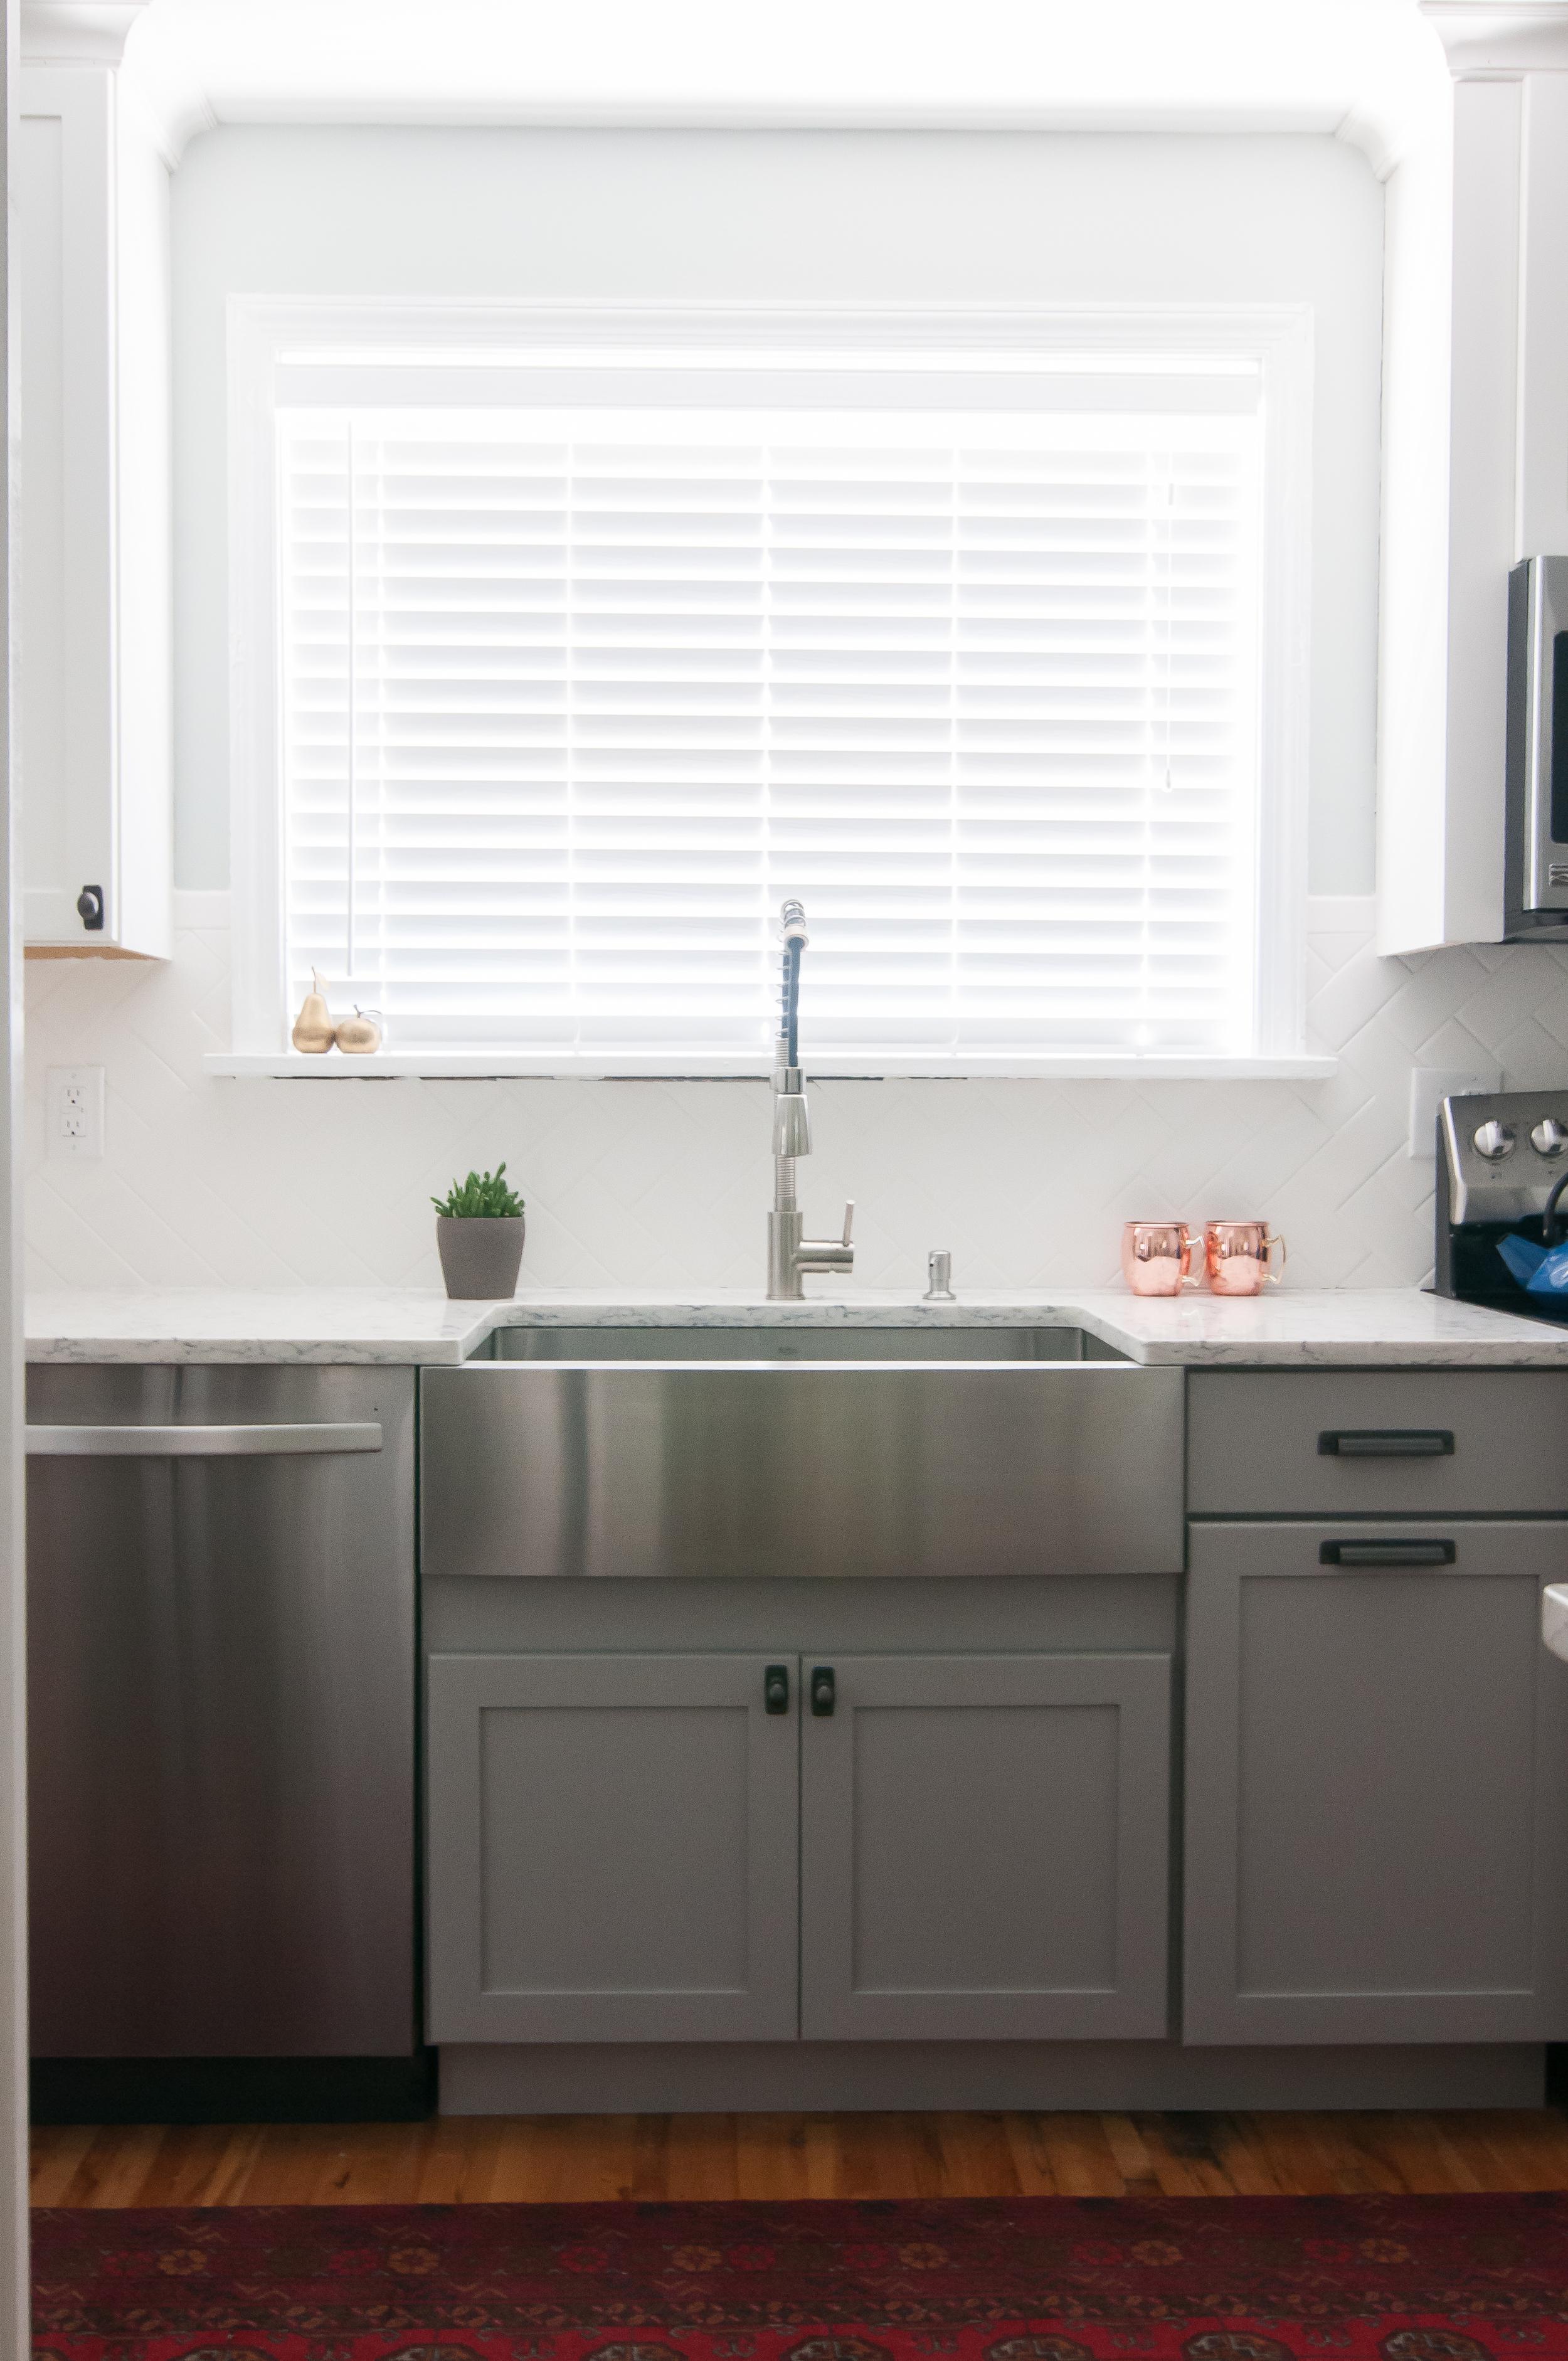 Hunter's Kitchen-18.jpg